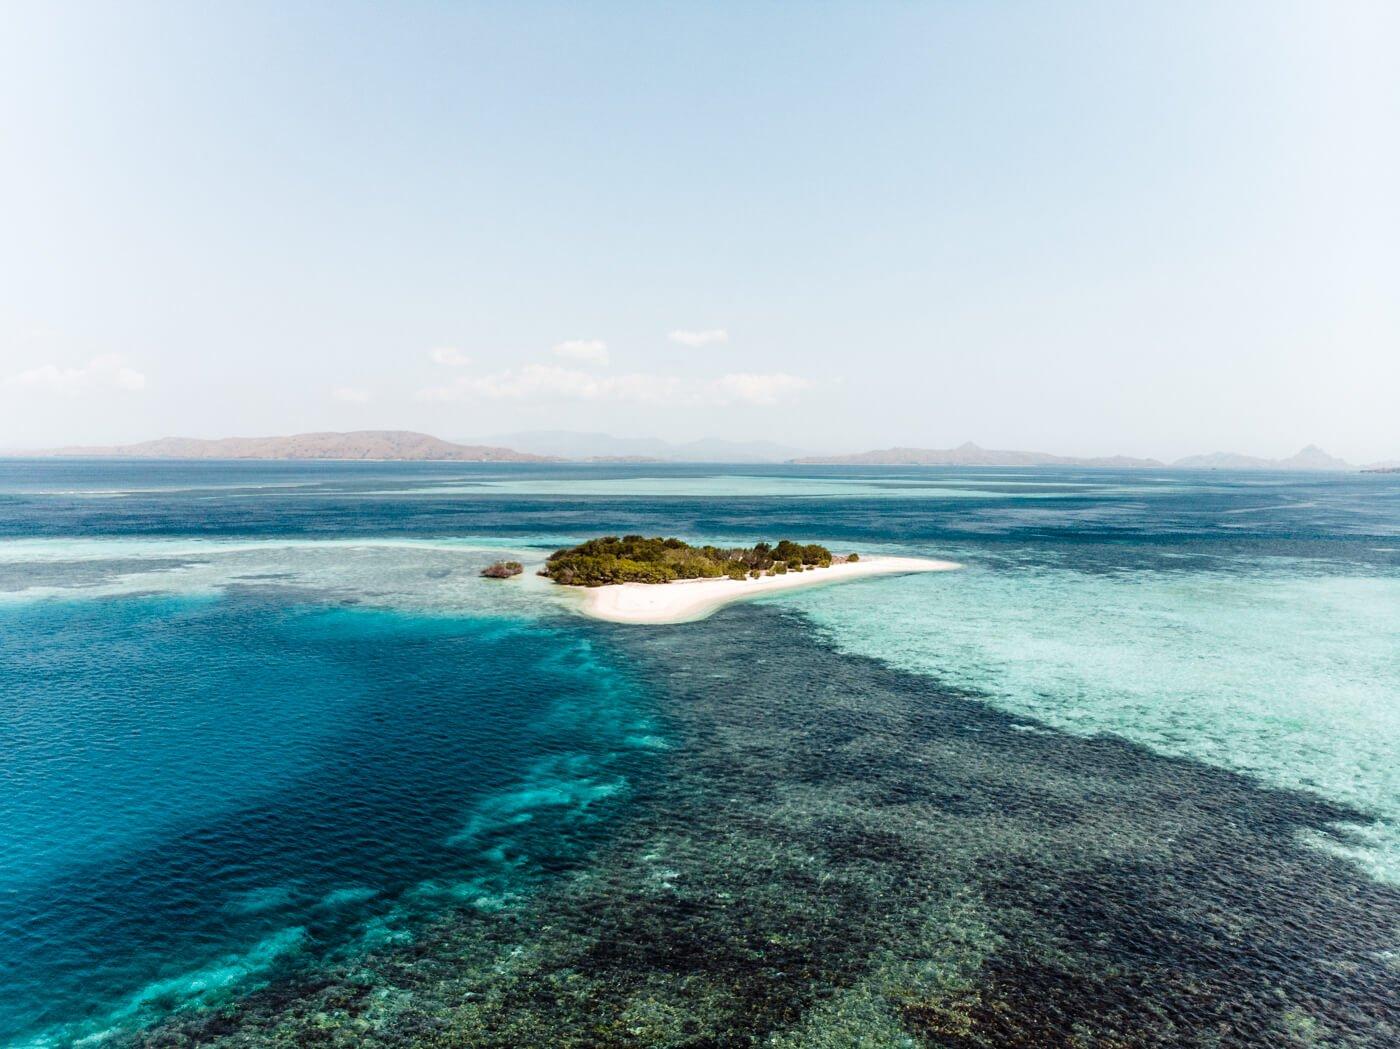 Roteiro Indonésia 3 semanas - Komodo